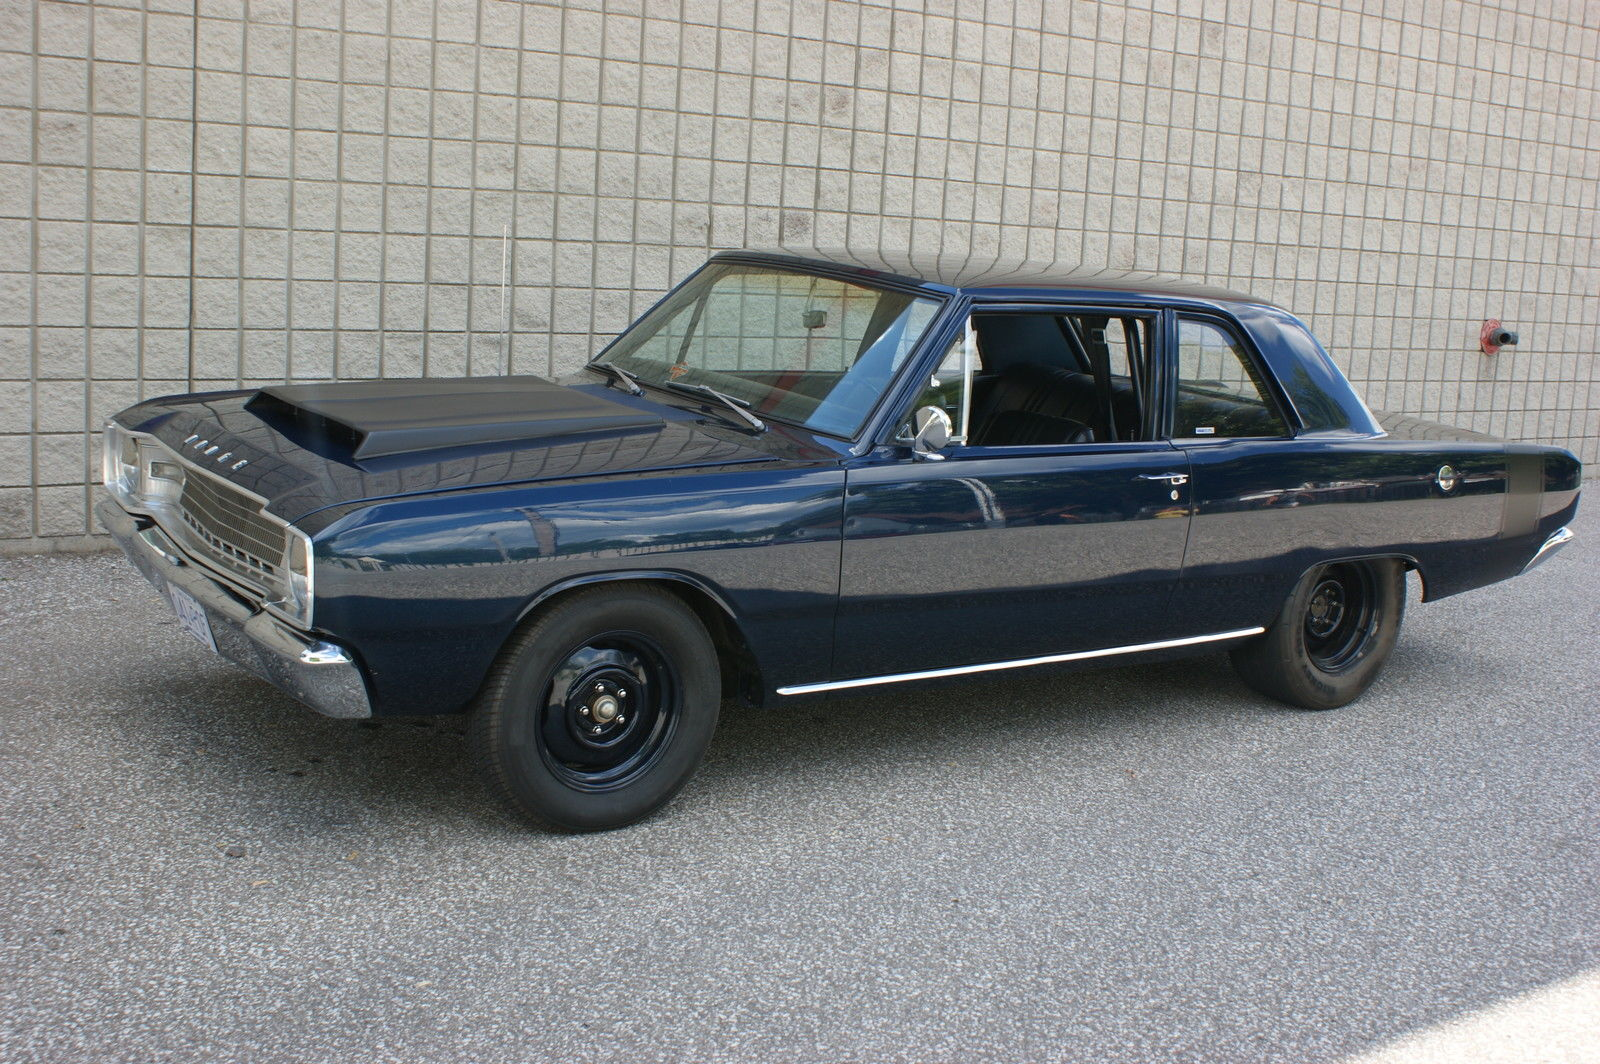 Bangshiftcom This 1967 Dodge Dart Sedan Is One Tough Looking Street